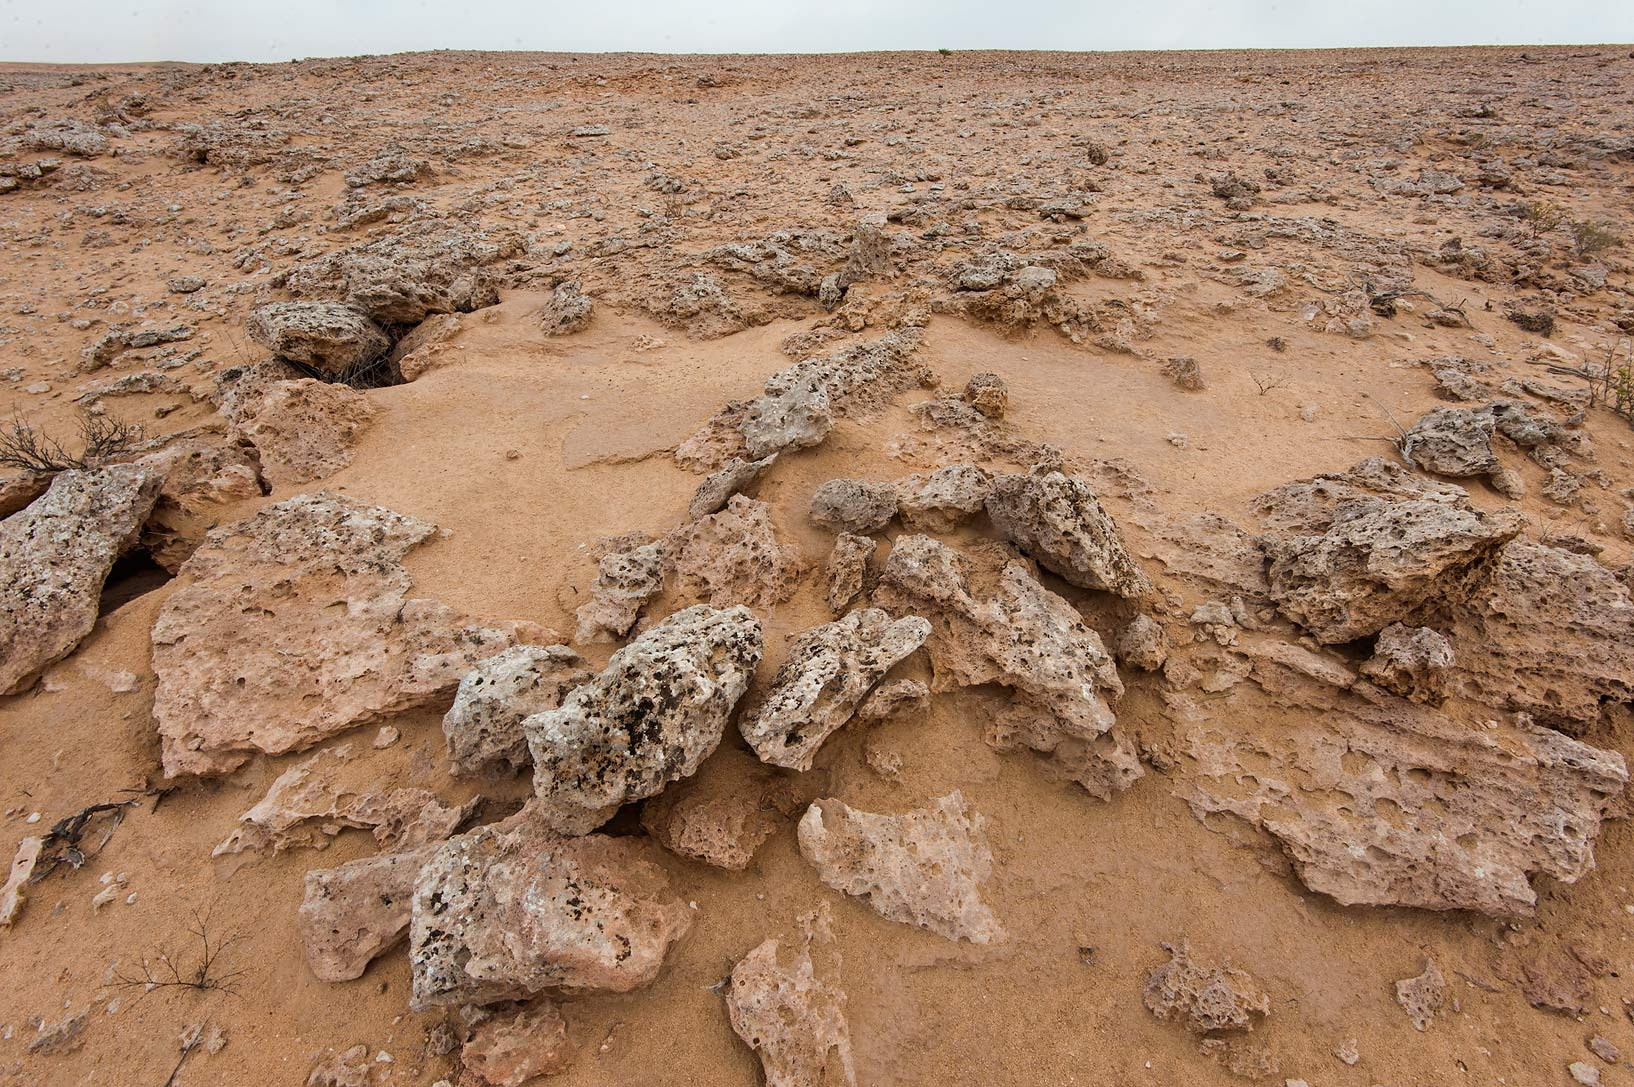 photo 156823 weathered limestone rocks in harrarah al